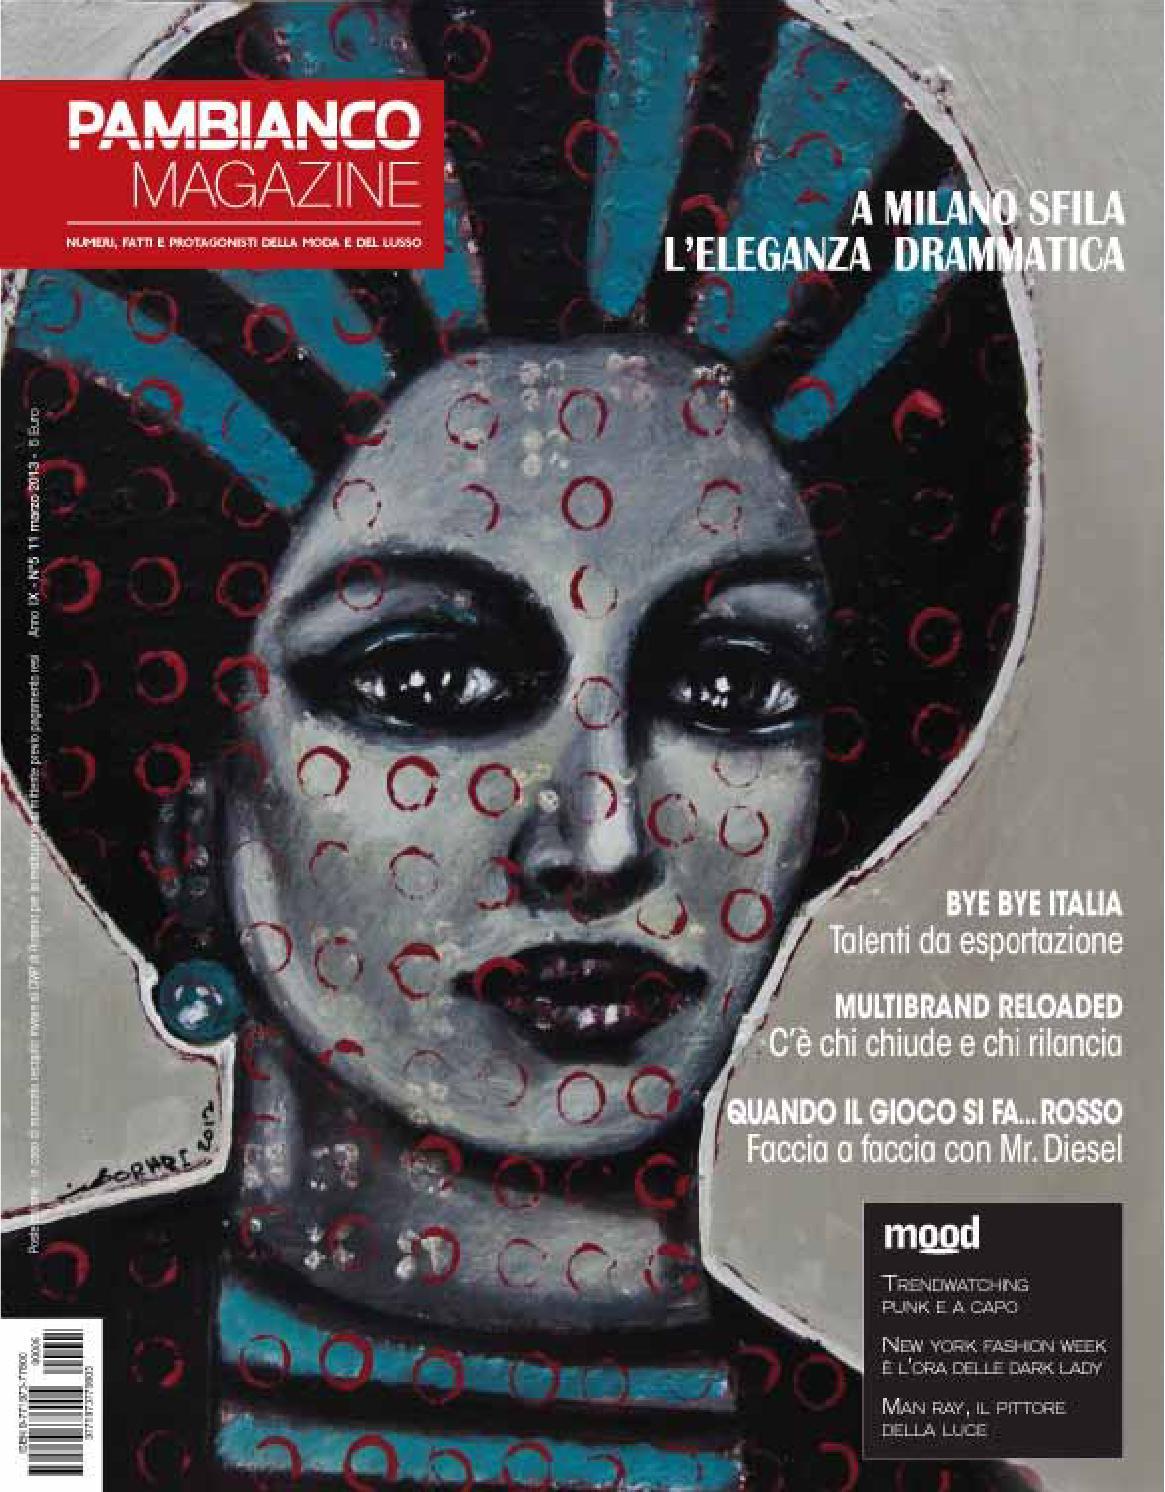 fe9cc05928ddc Pambianco Magazine N.5 IX by Pambianconews - issuu